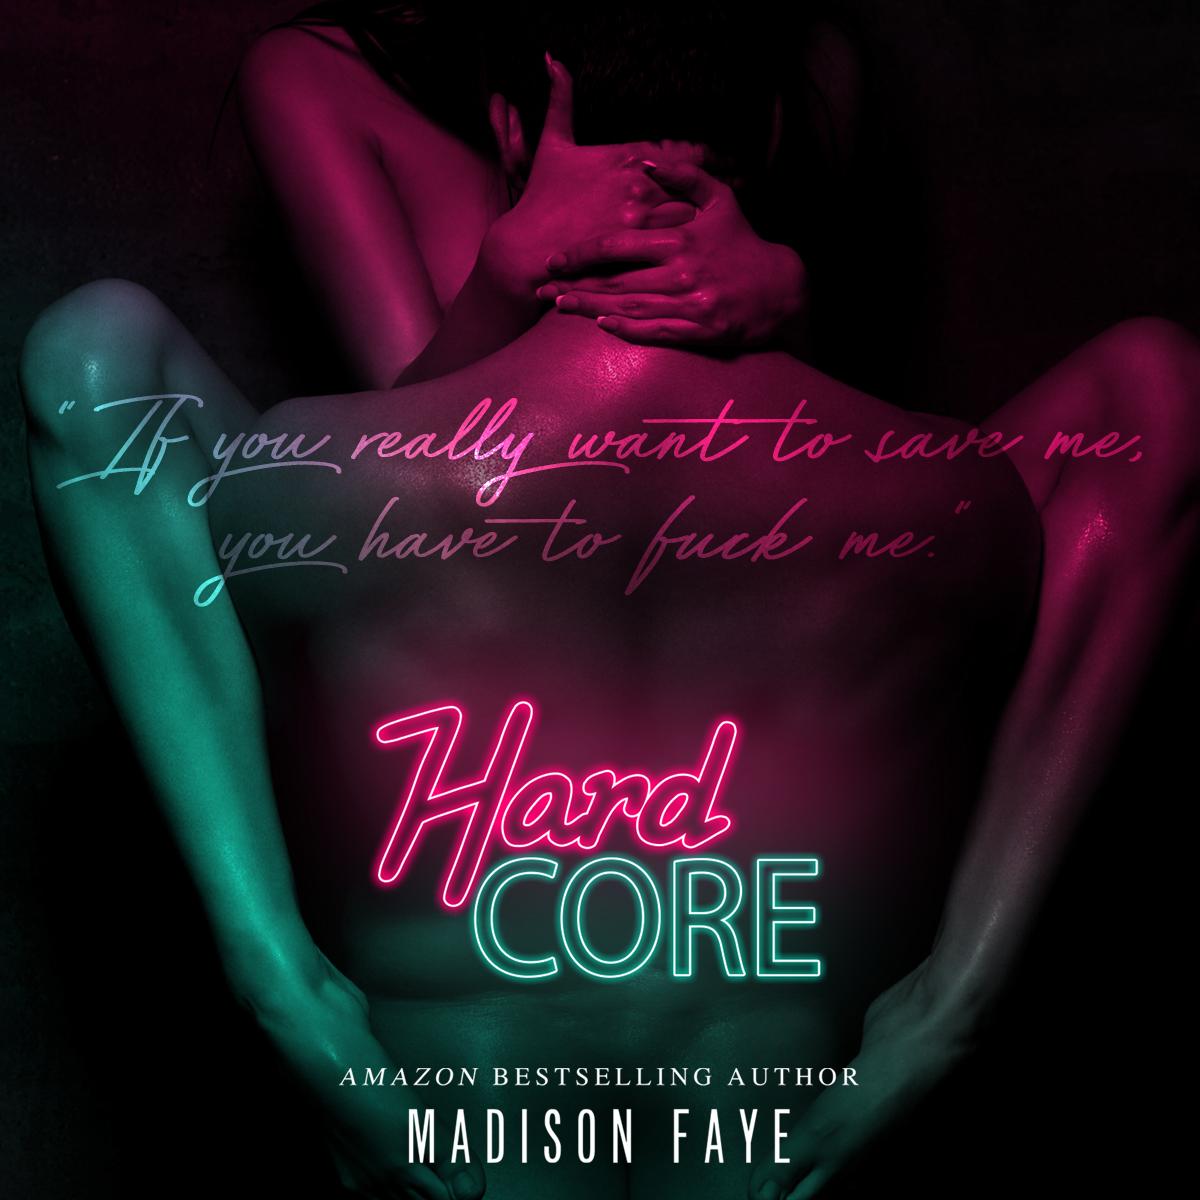 Hard-Core-Teasercouple1.jpg